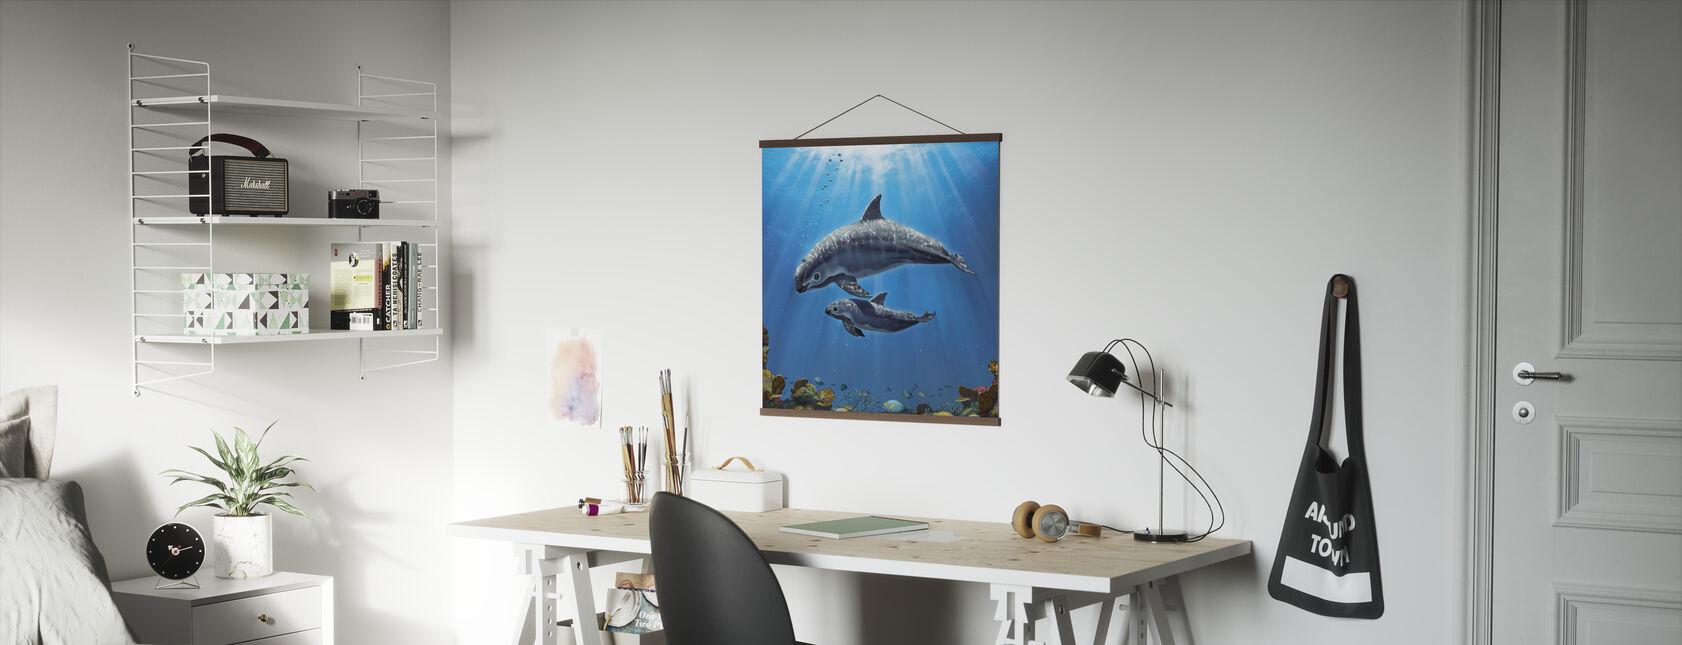 Vaquita Critically Endangered - Poster - Office